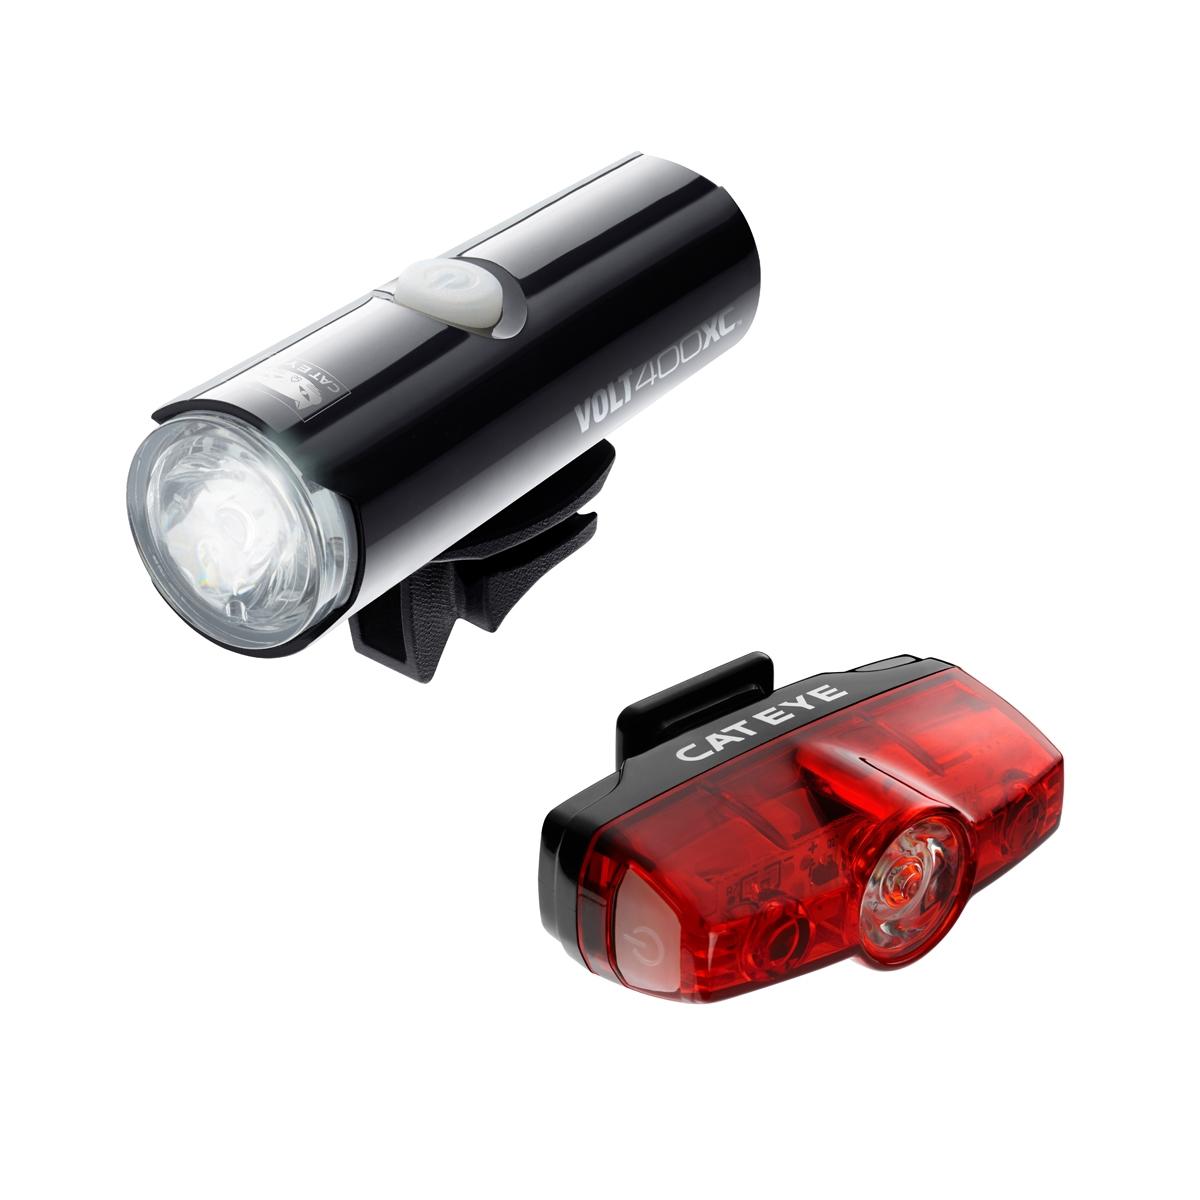 Cateye Volt 400 XC Front and Rapid Mini Rear LED Lightset